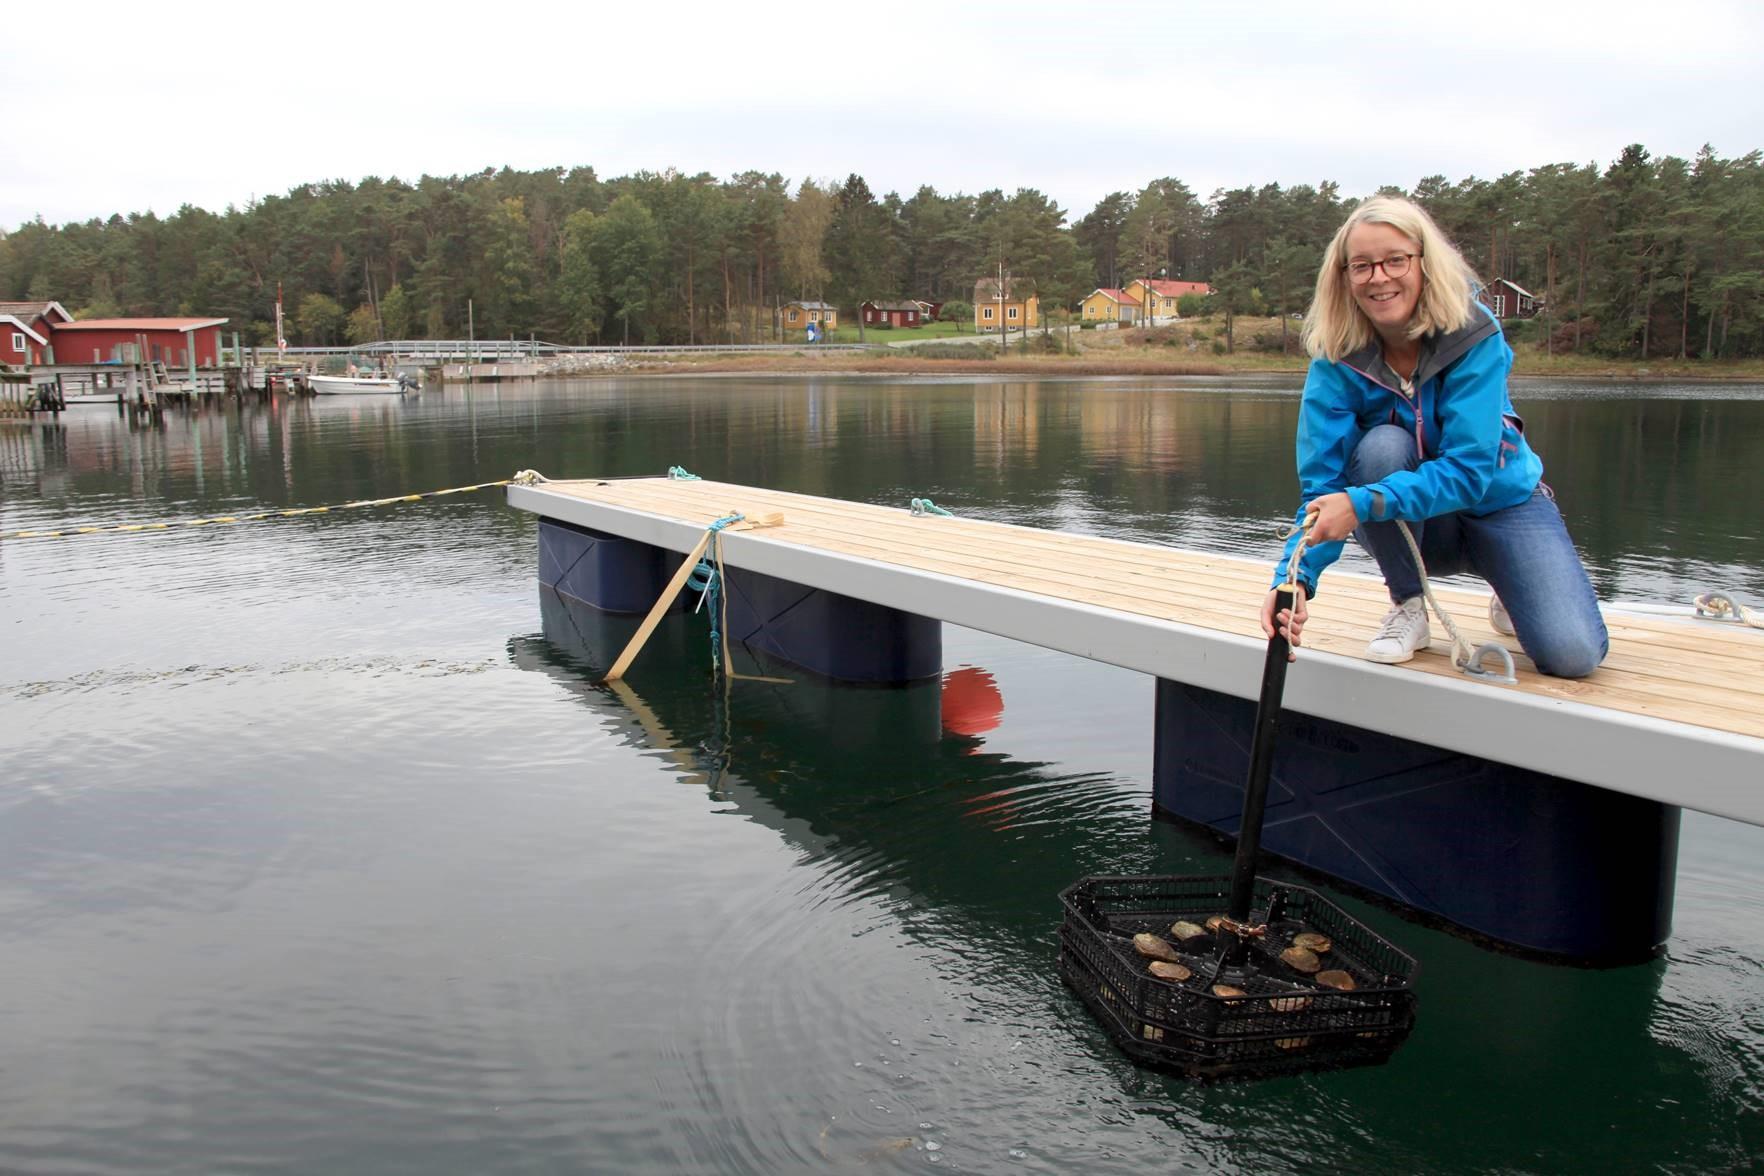 Marina kolonilotte foto Susanne Liljenström